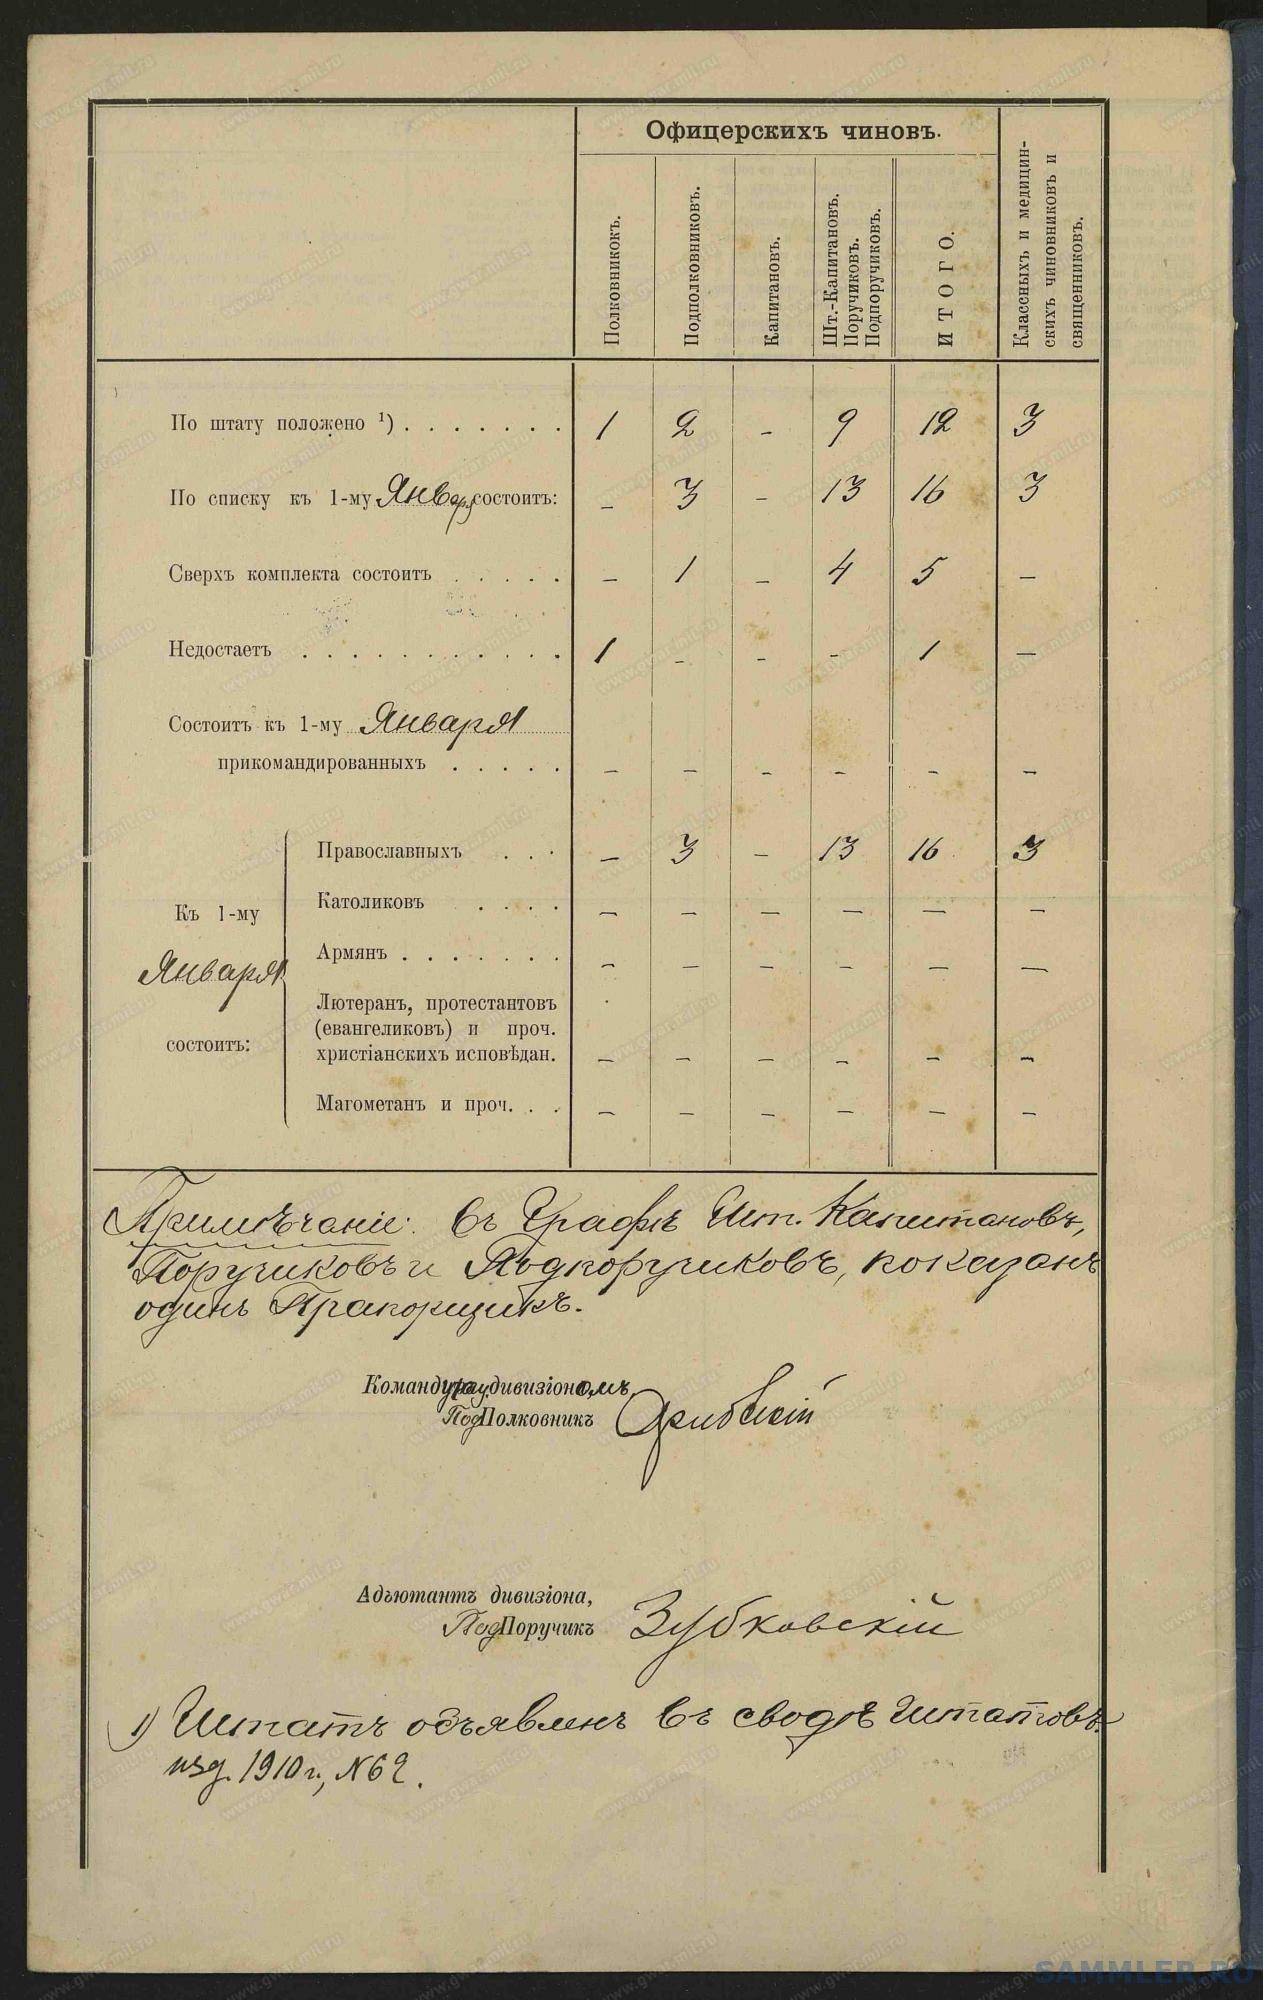 Список офицеров 7-го конно-артиллерийского дивизиона на 01.01.1915__13_.jpg